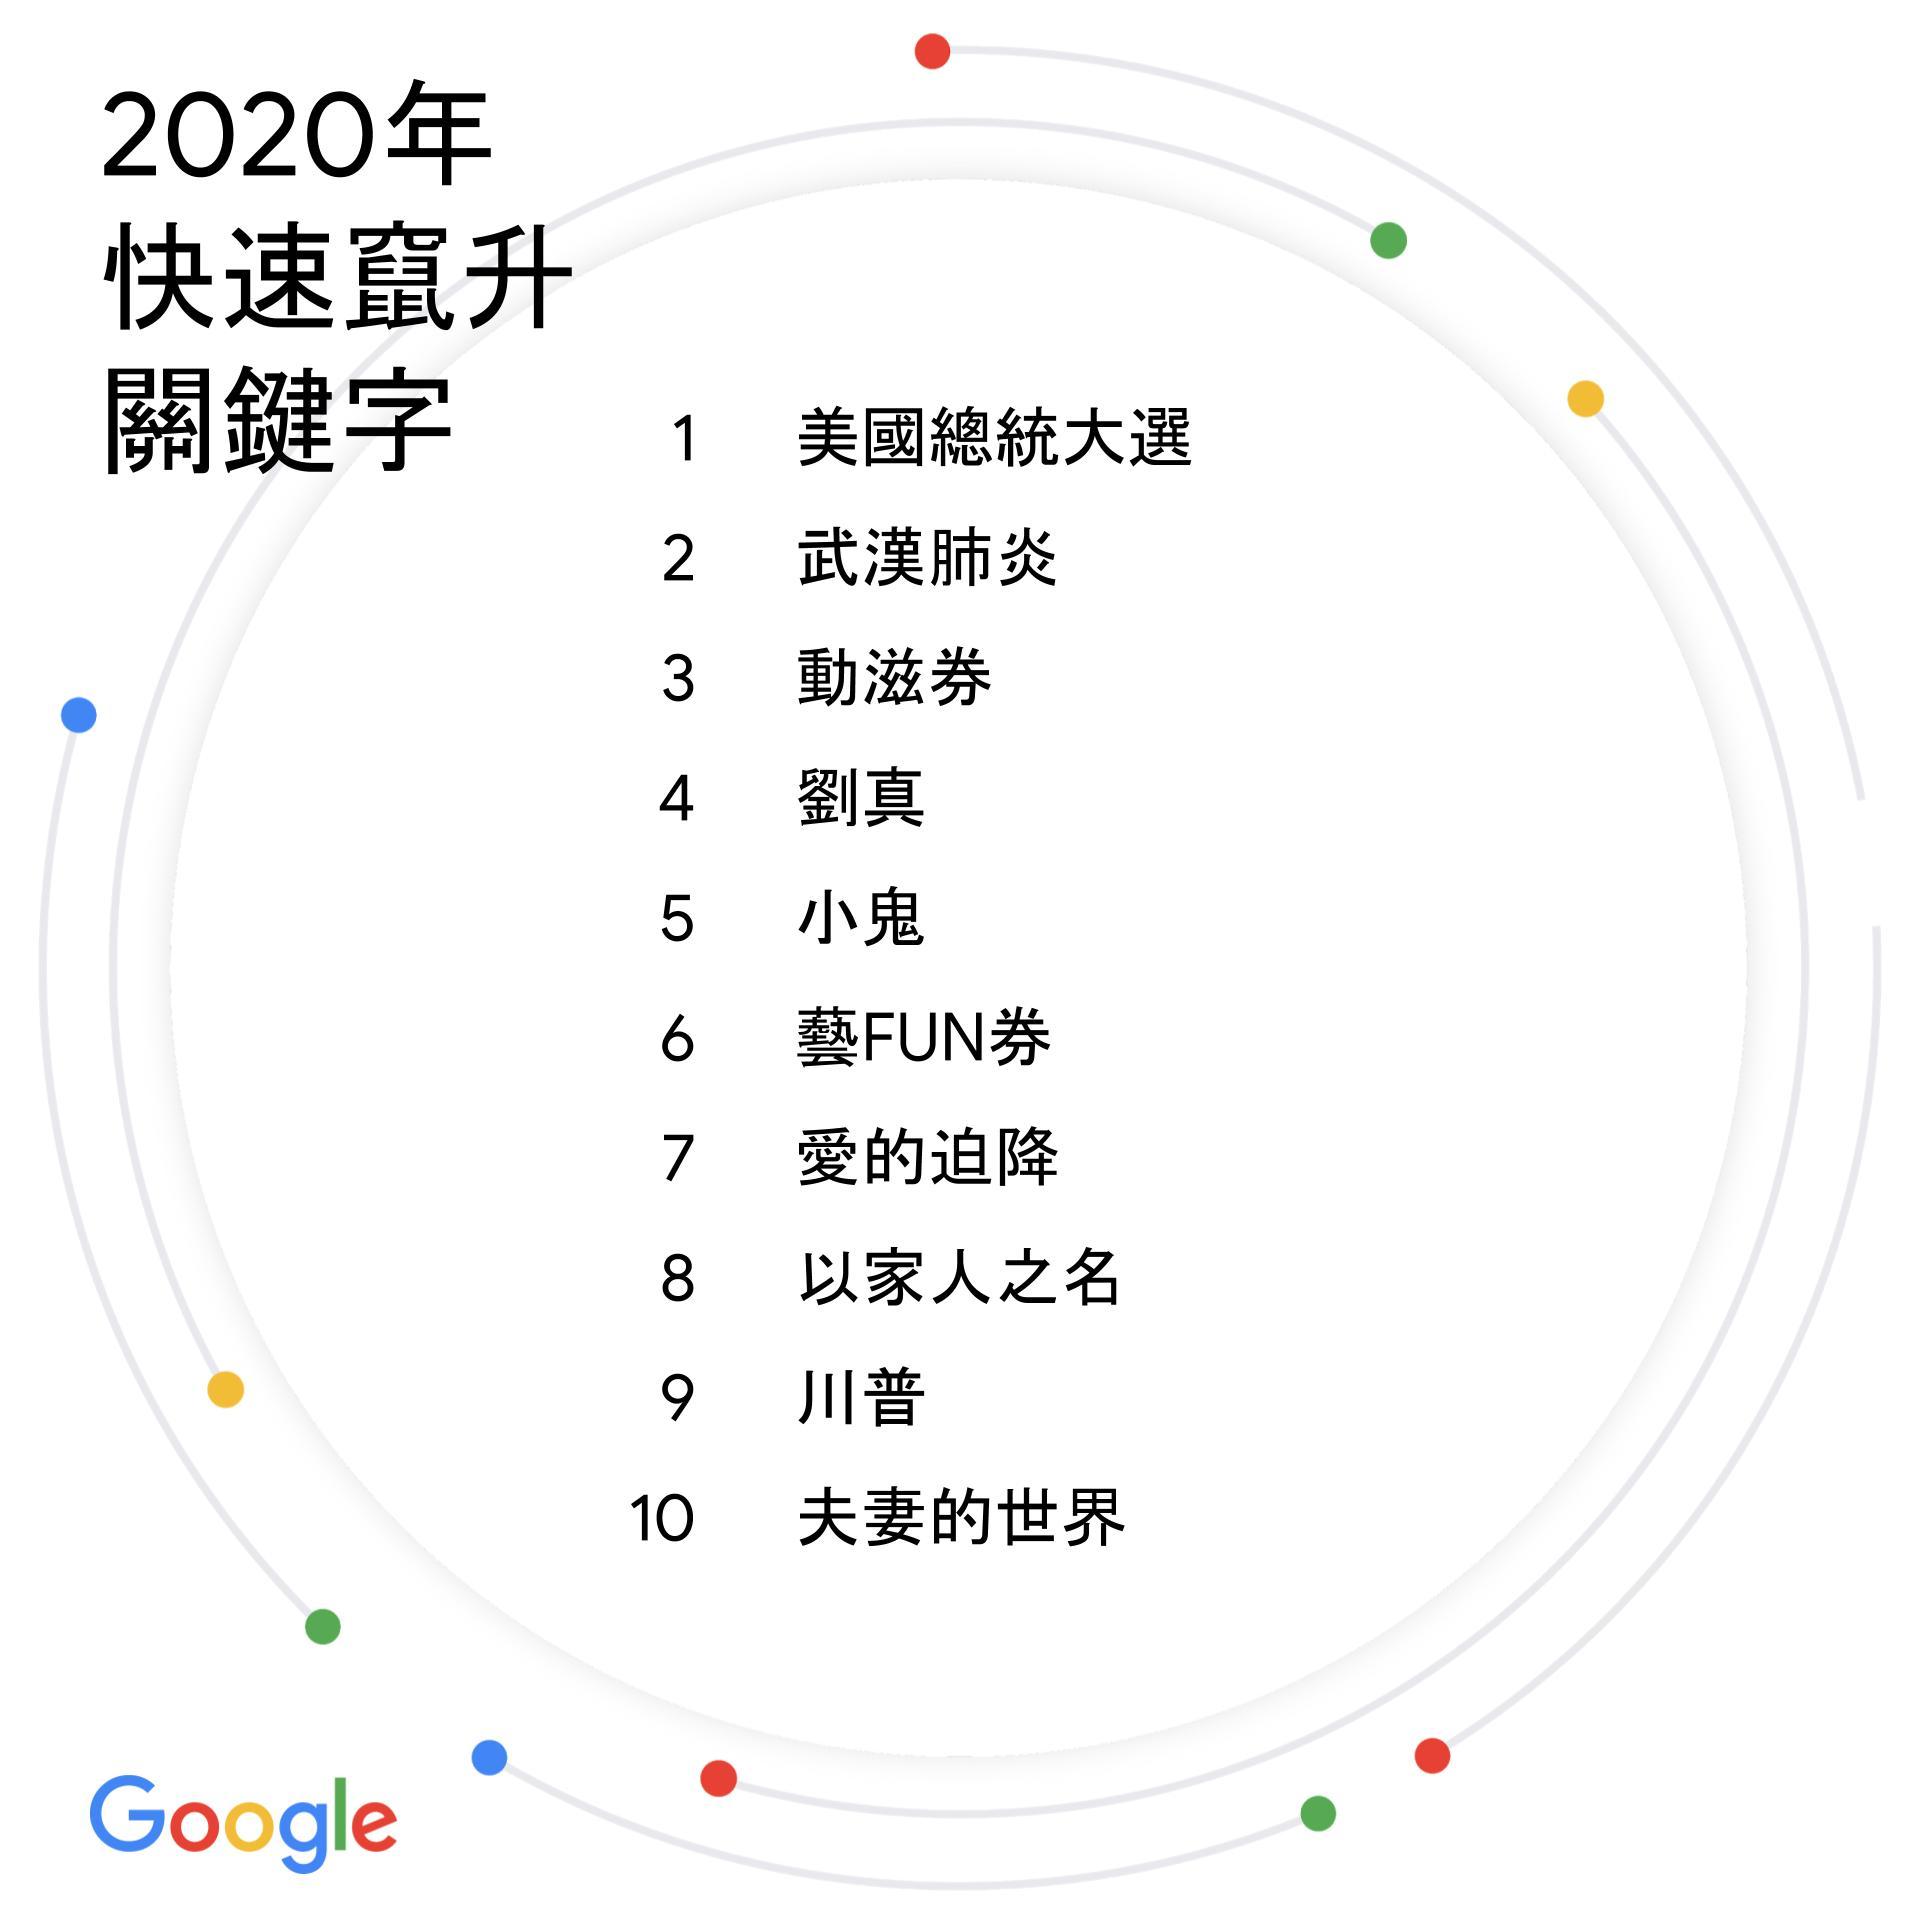 Google 公布 2020 年搜尋排行榜,武漢肺炎只排第二名